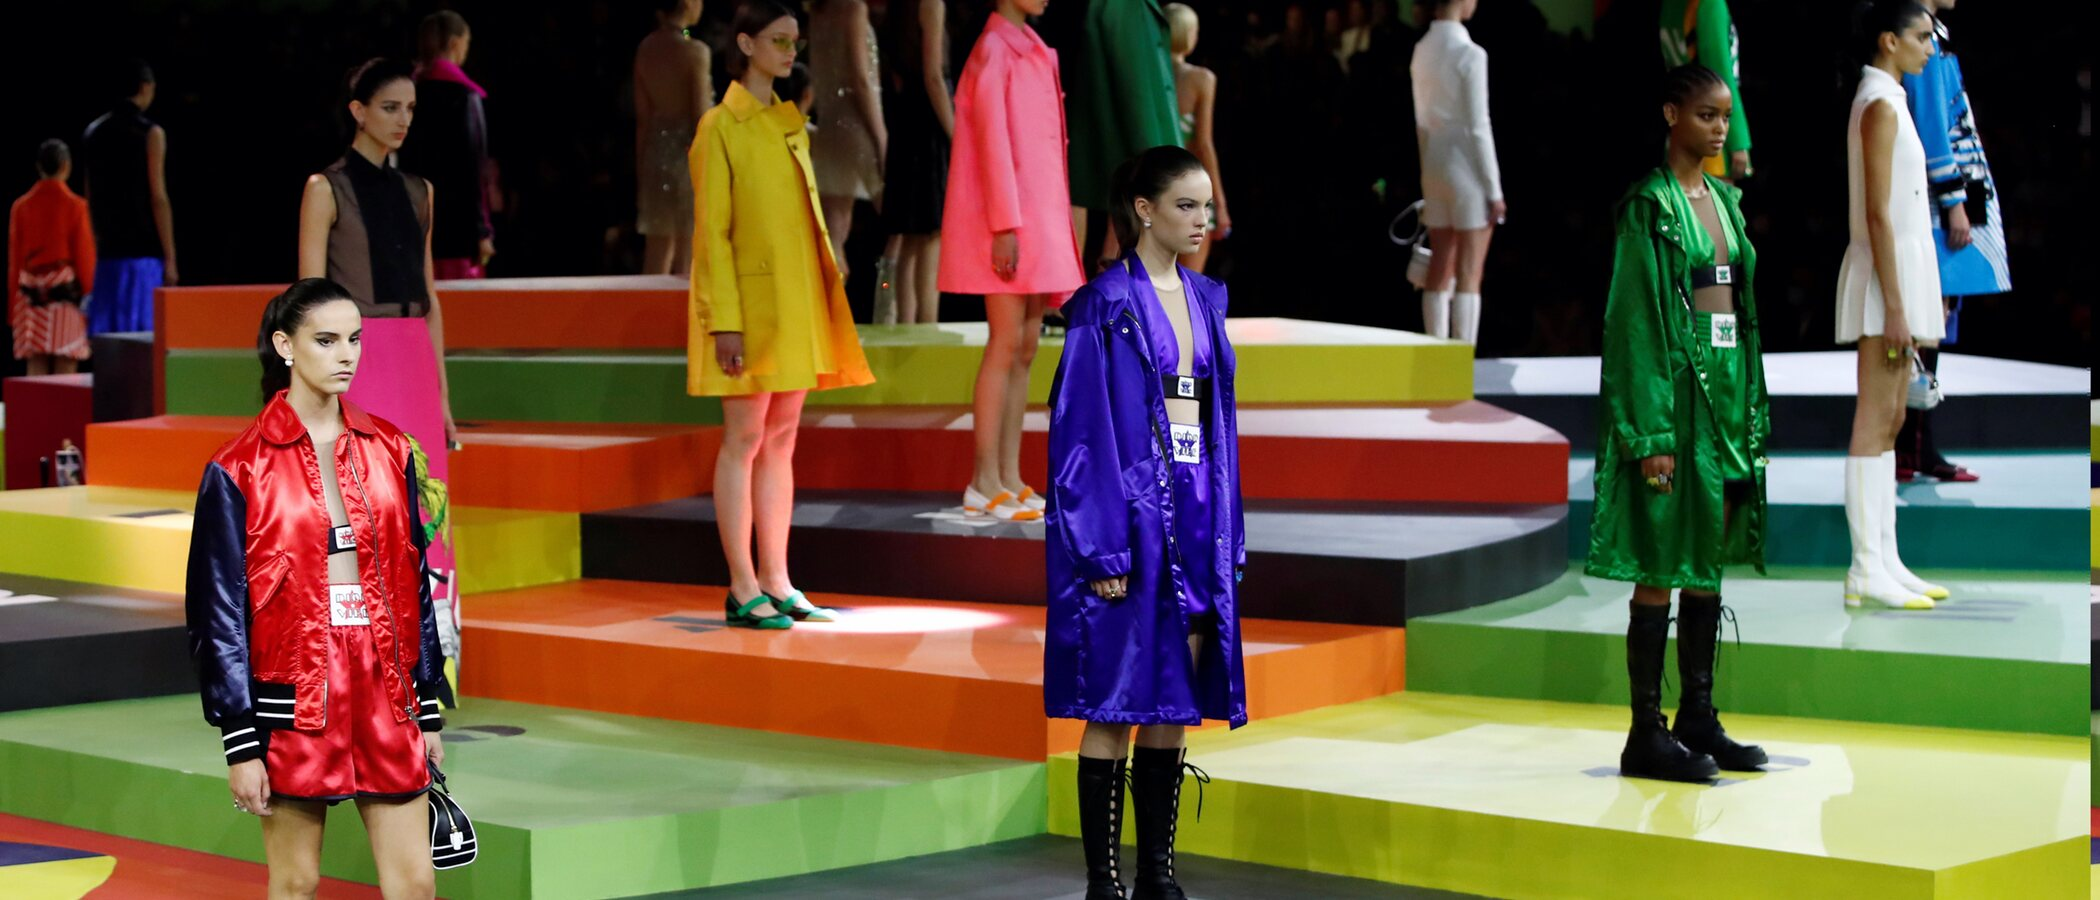 Maria Grazia Chiuri invita a jugar con la colección primavera/verano 2022 de Dior